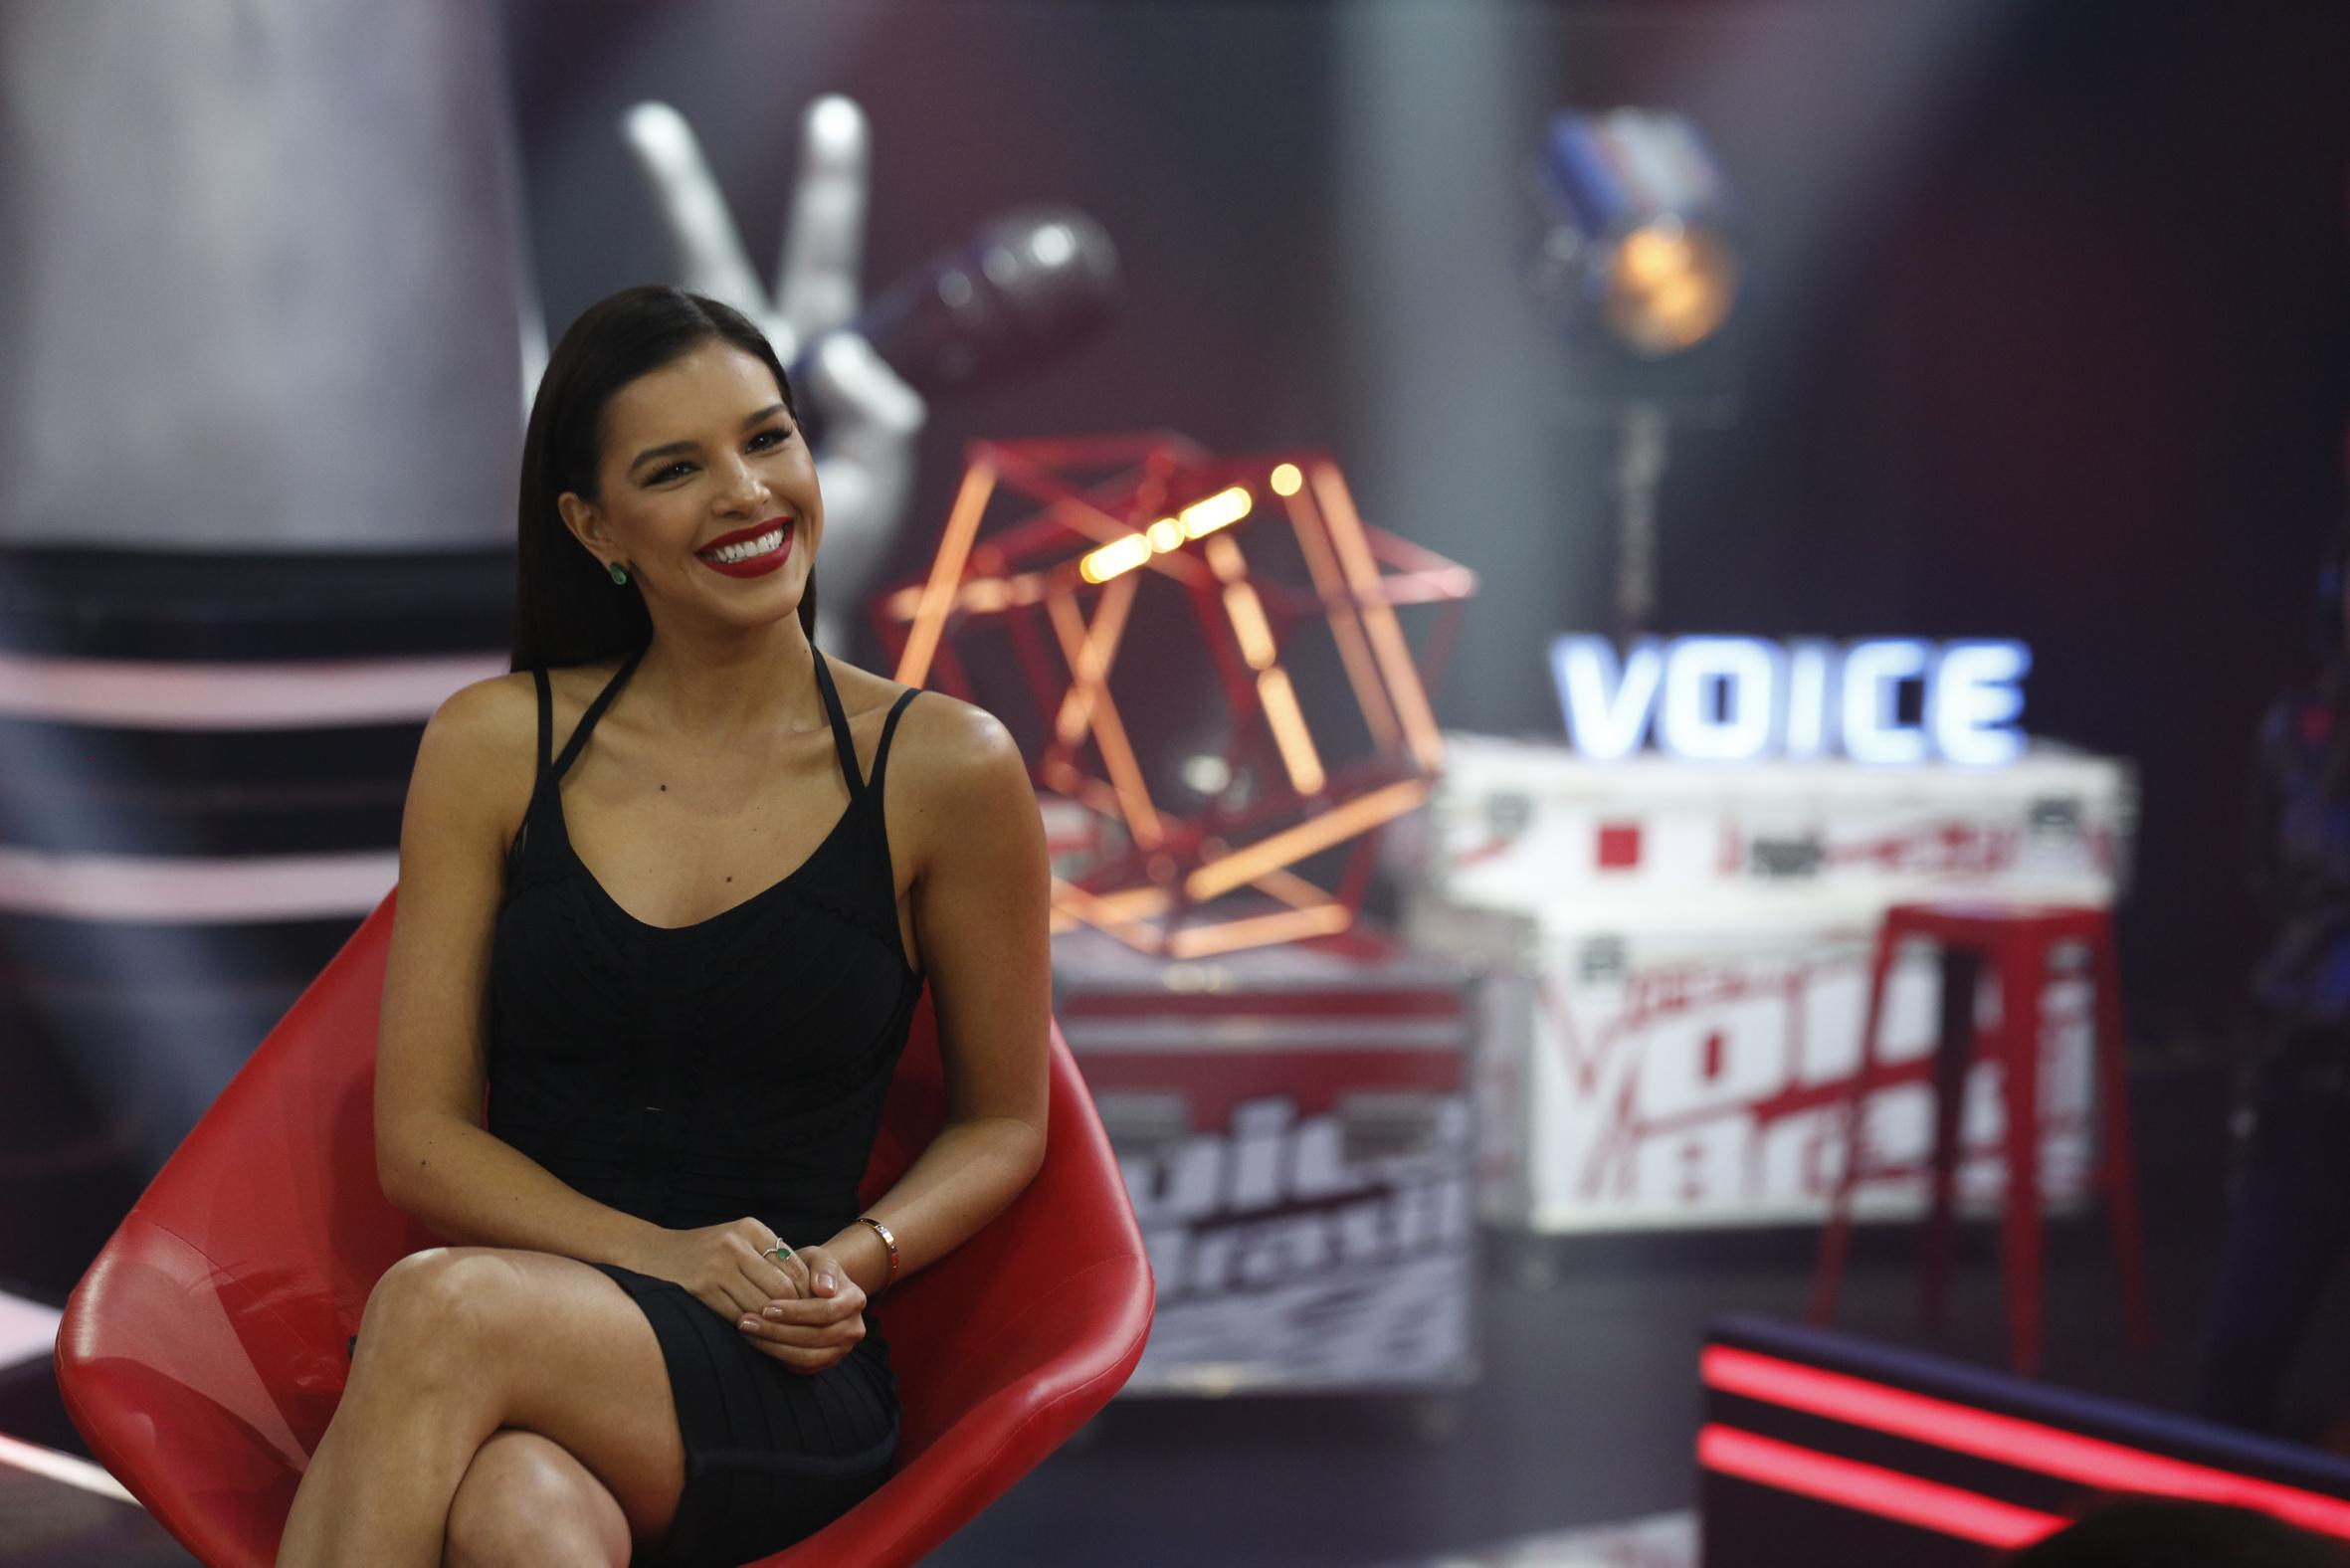 The Voice Brasil - Mariana Rios